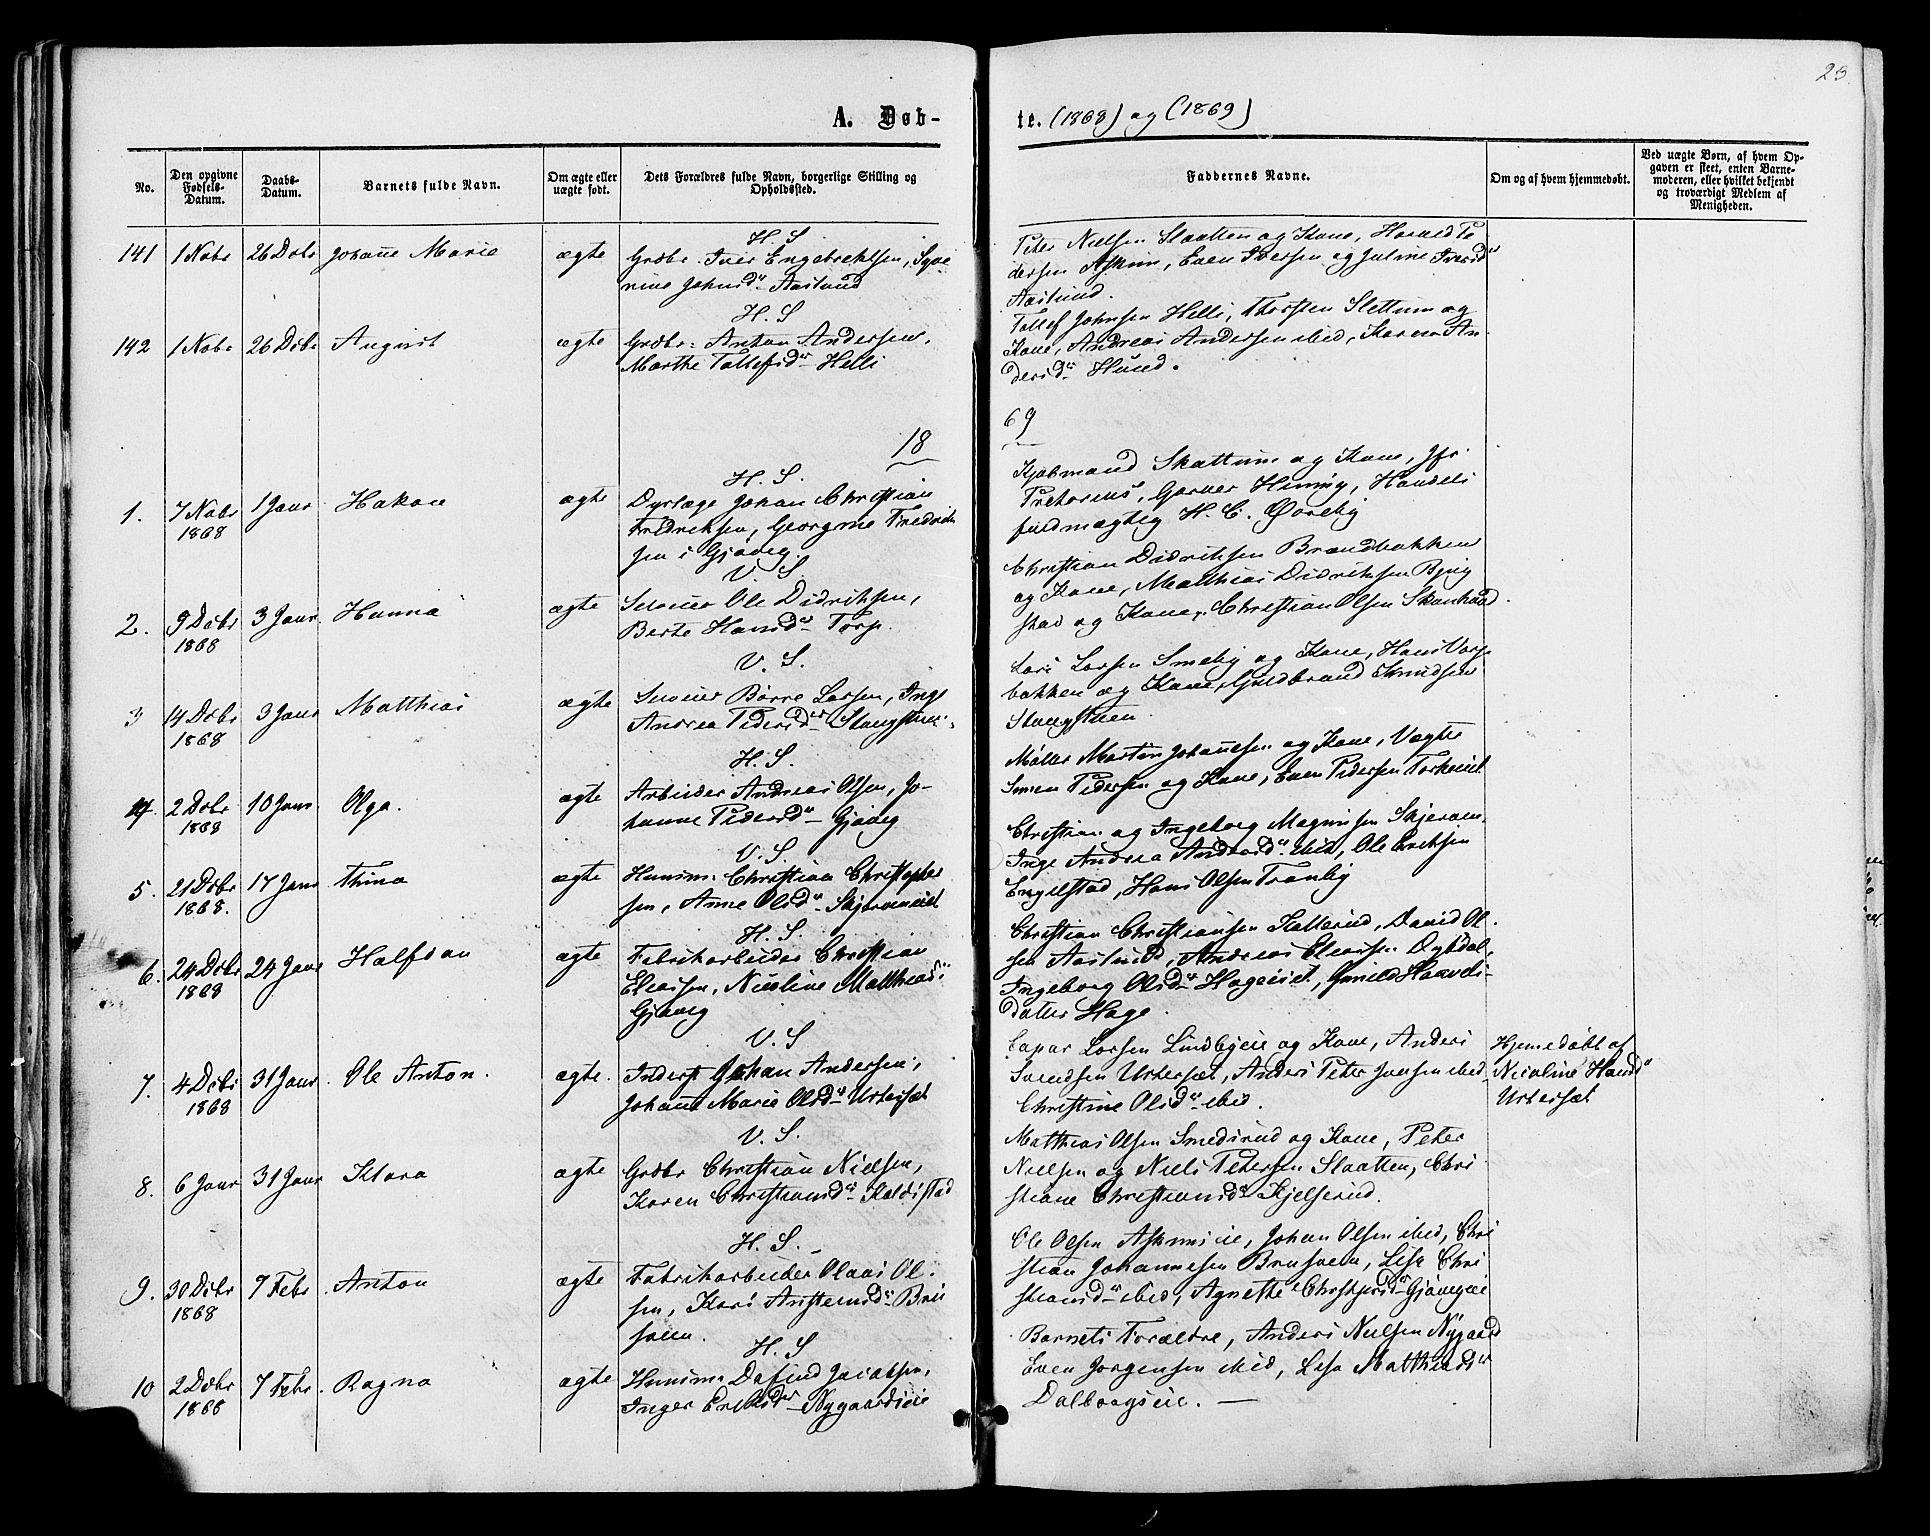 SAH, Vardal prestekontor, H/Ha/Haa/L0007: Ministerialbok nr. 7, 1867-1878, s. 23